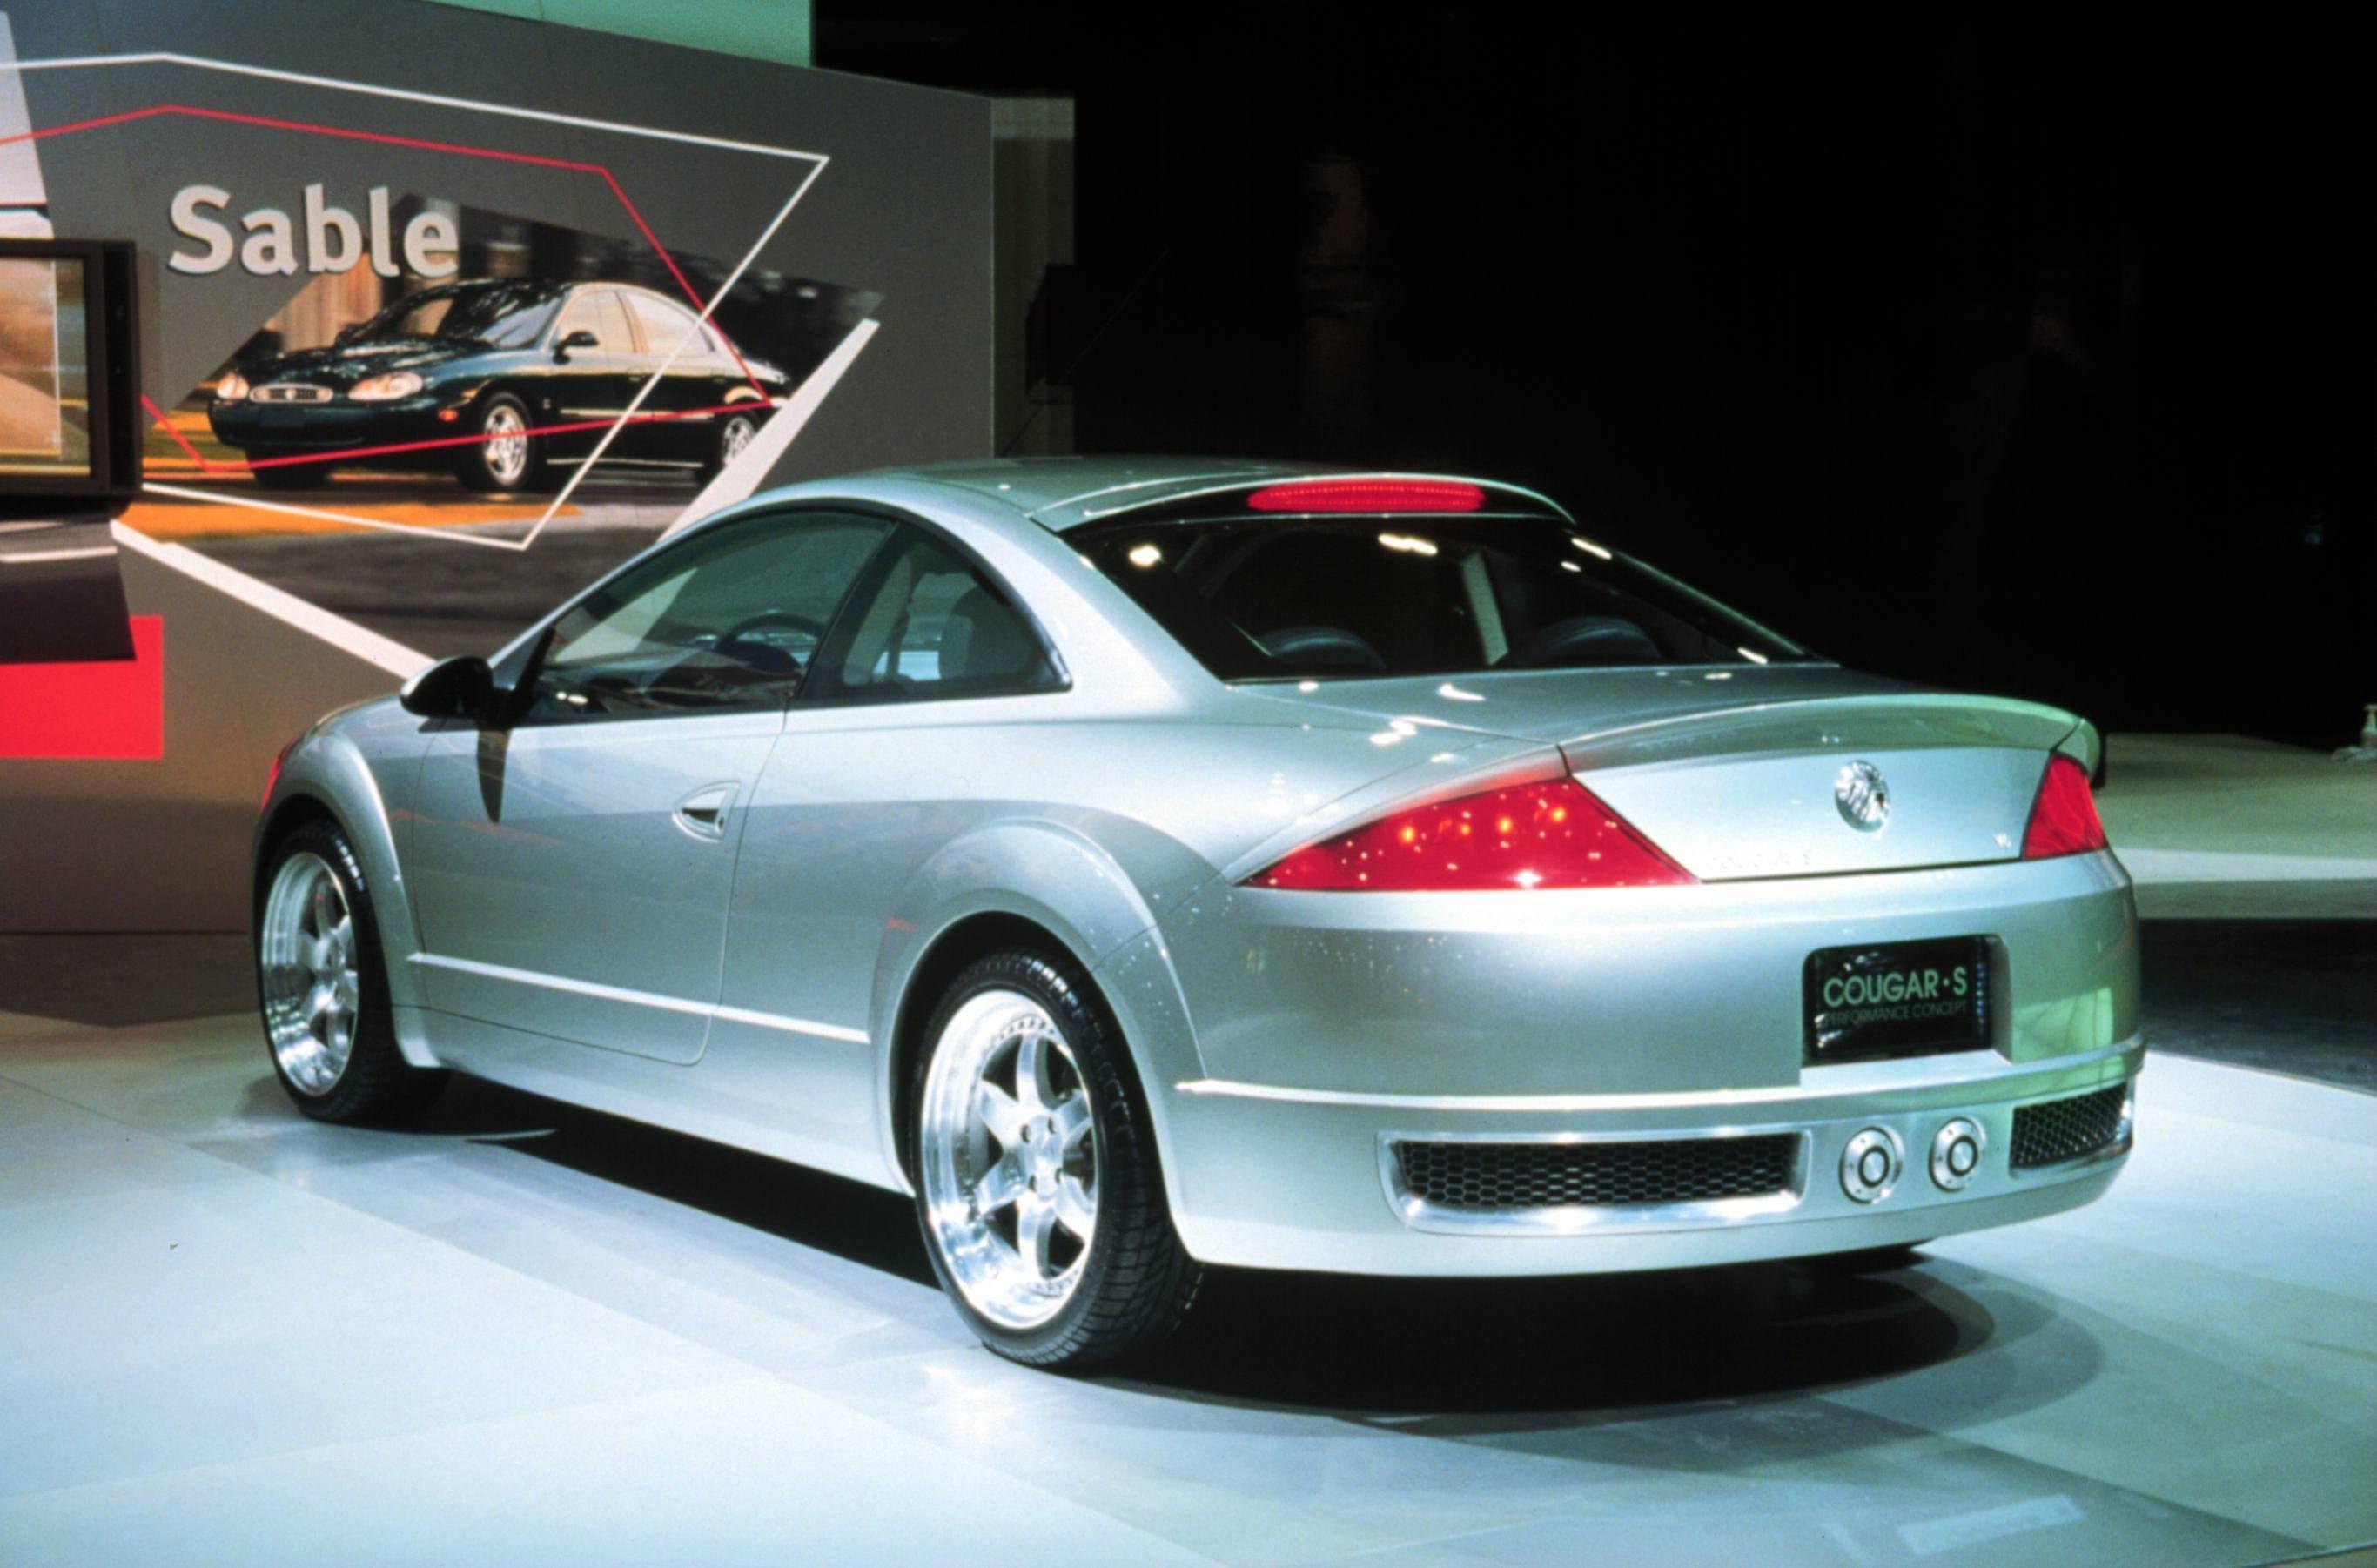 1999 mercury cougar s concept car the cougar s concept is an all wheel